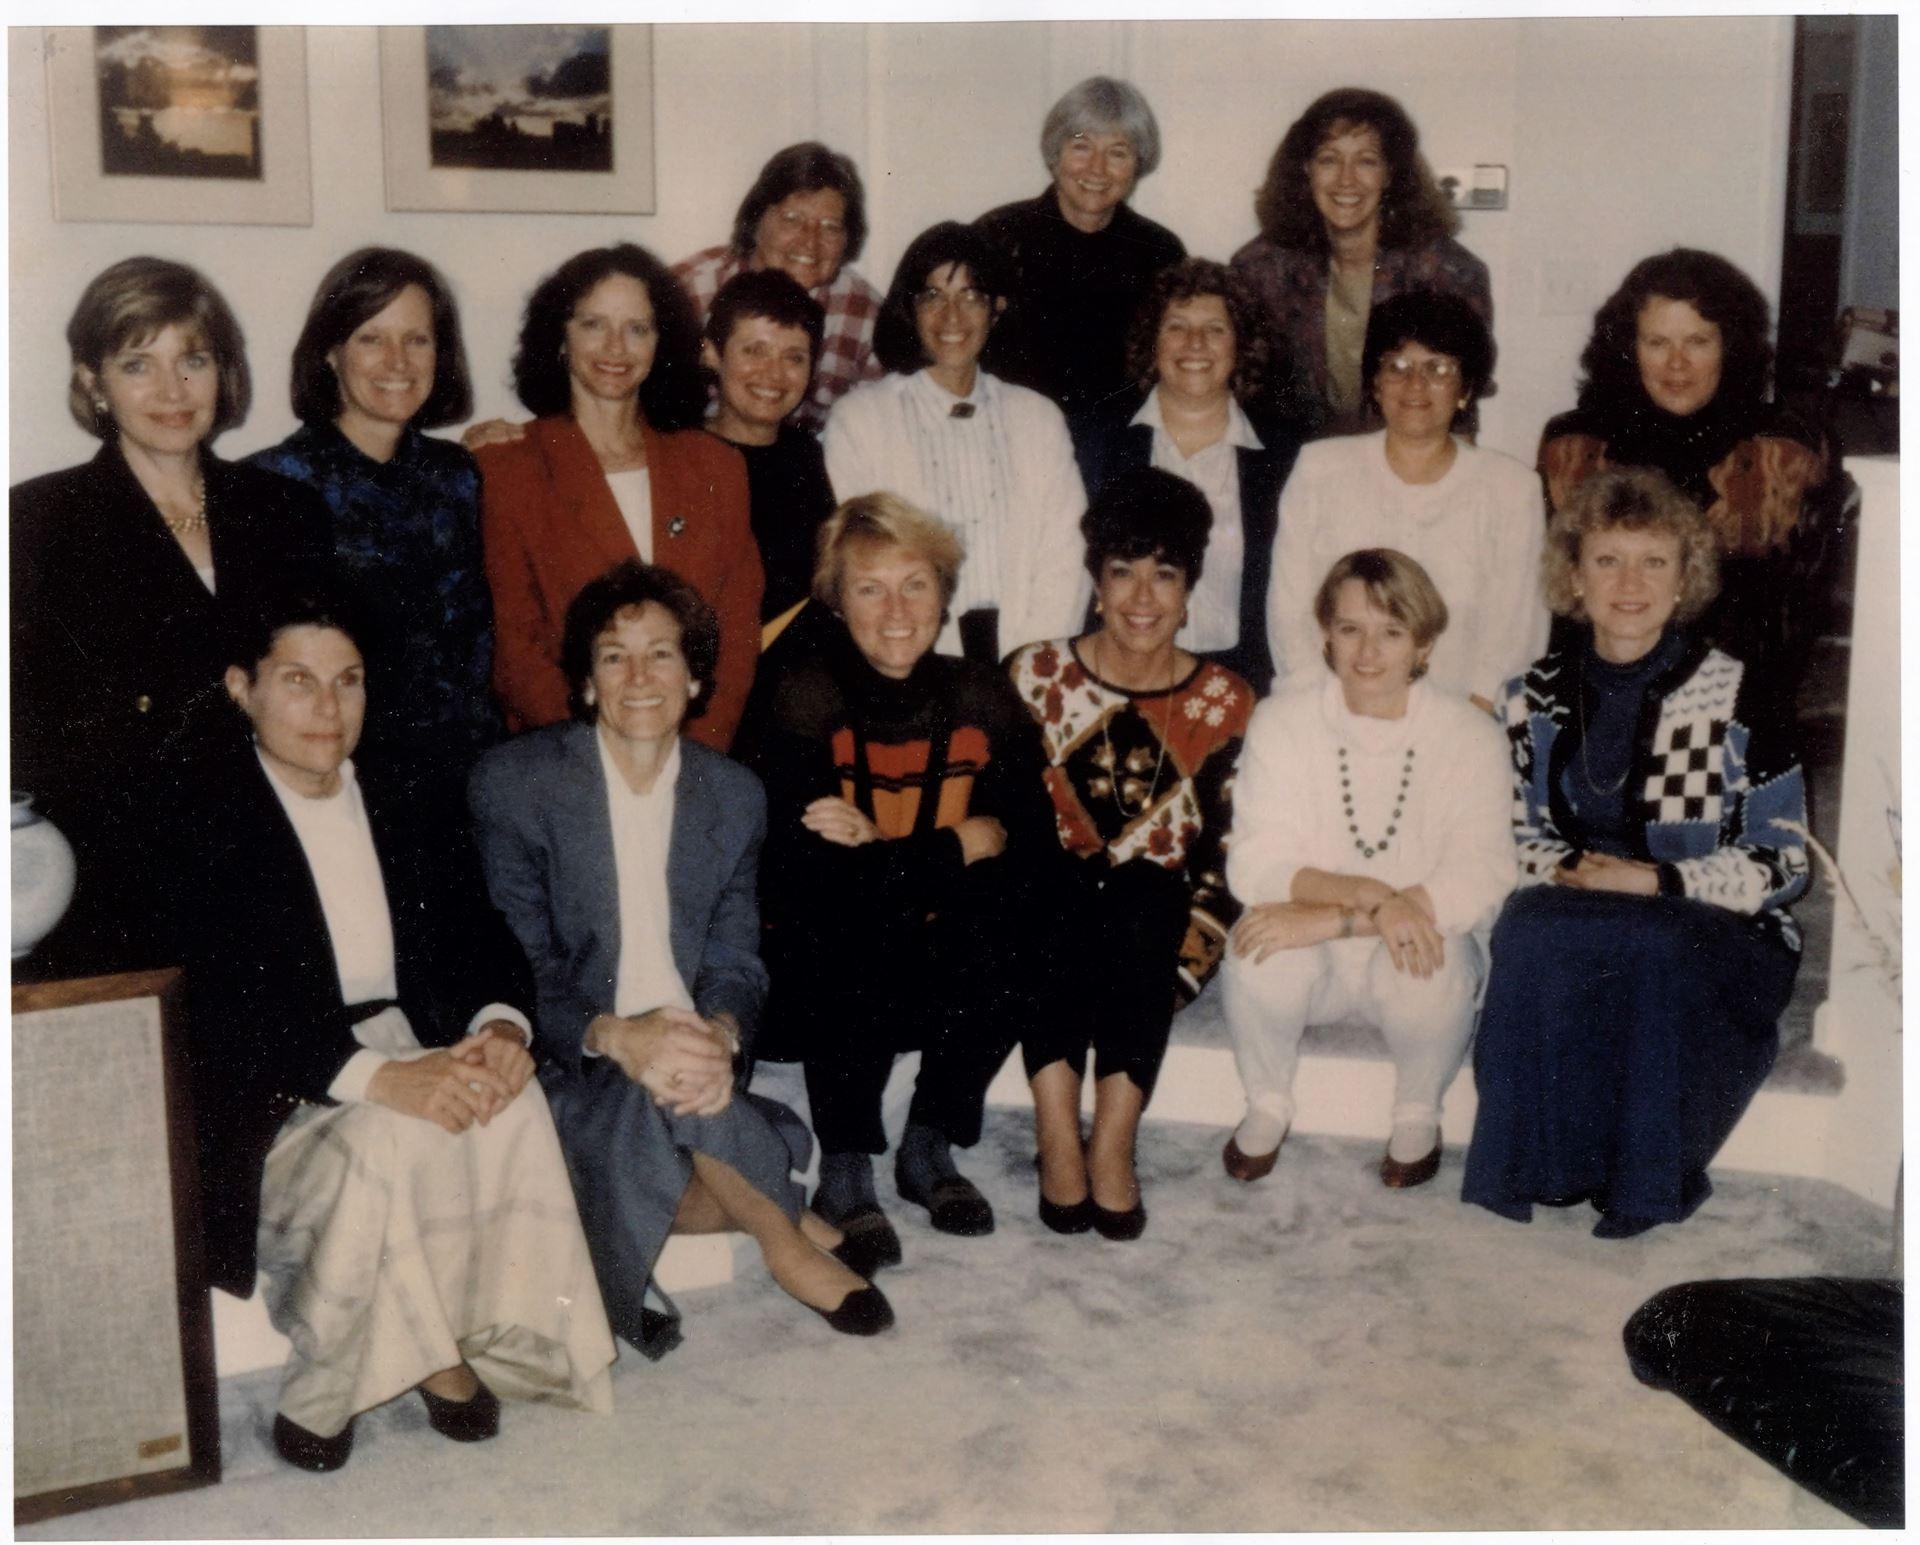 Colorado Women's Bar Association - PAST PRESIDENTS